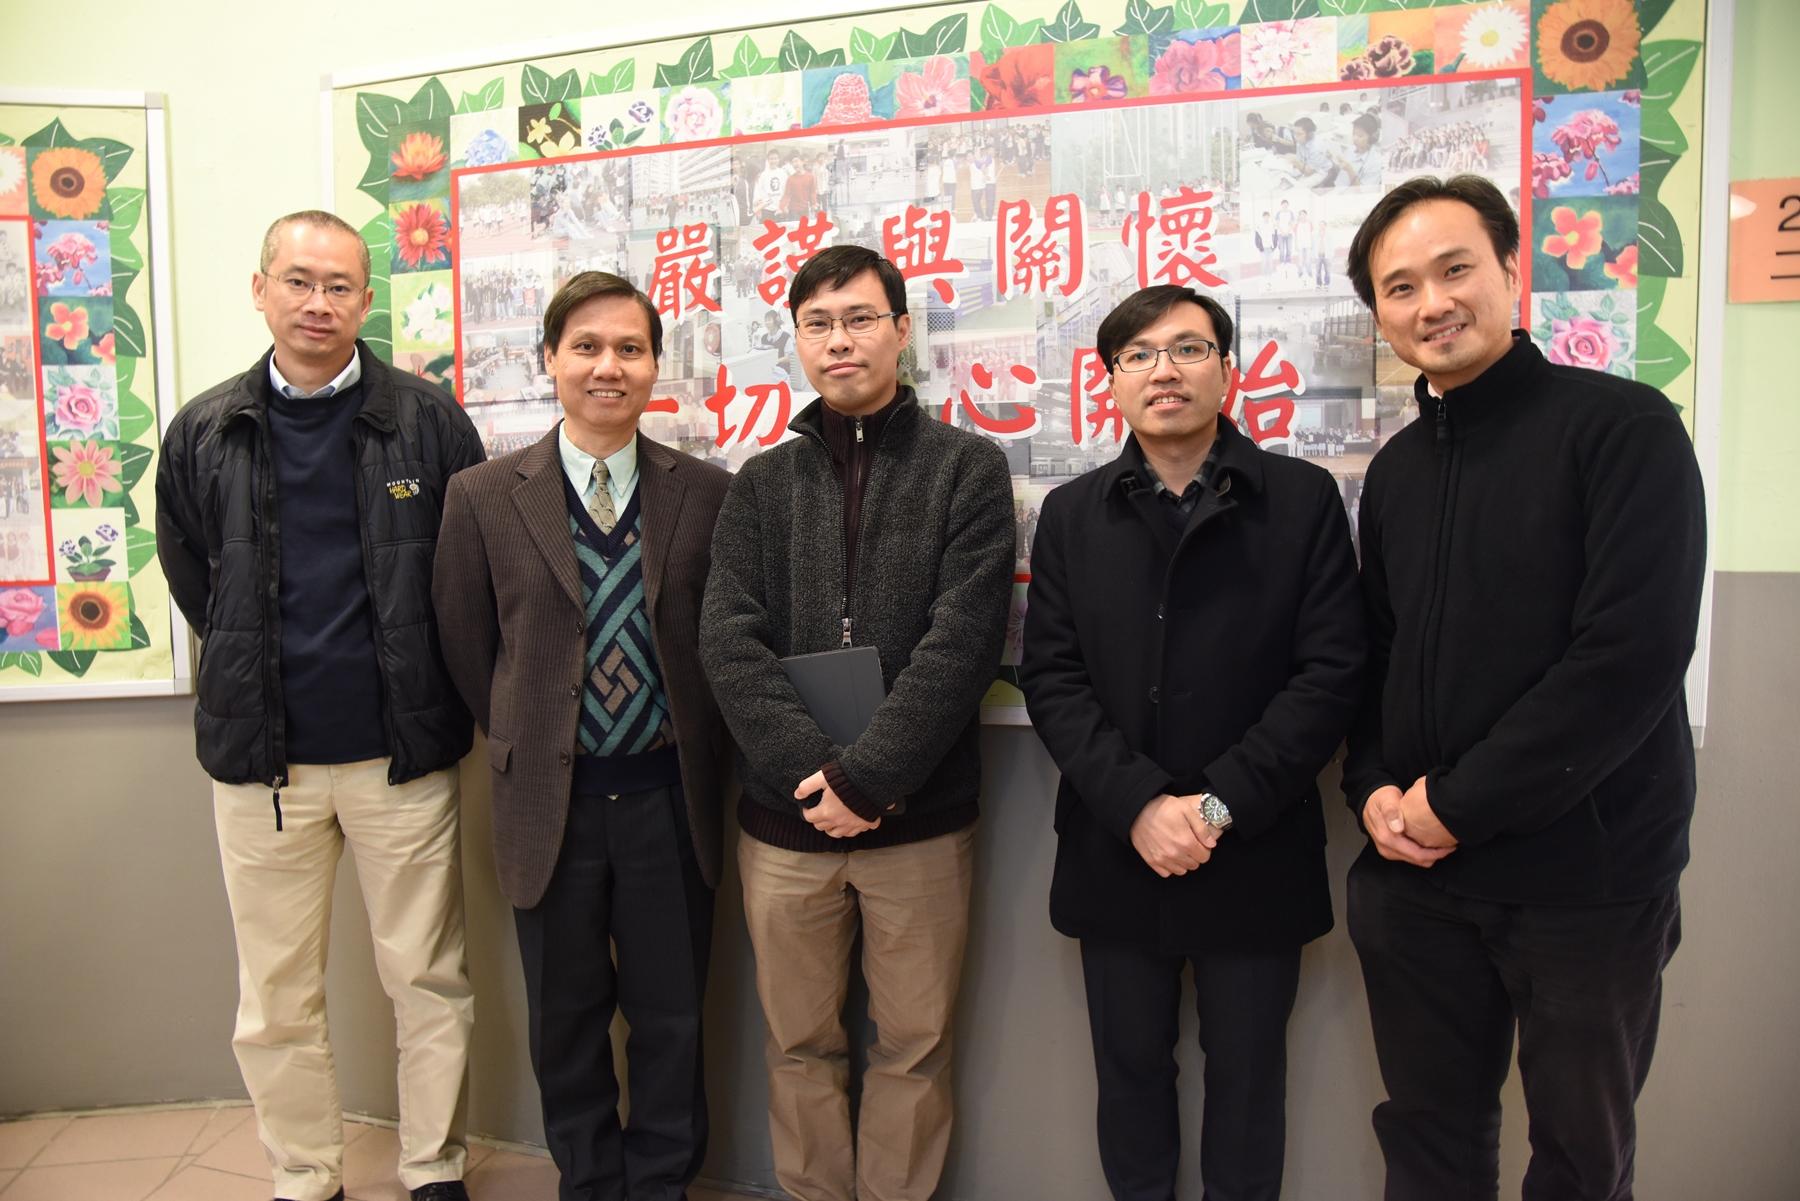 http://npc.edu.hk/sites/default/files/dsc_6423.jpg